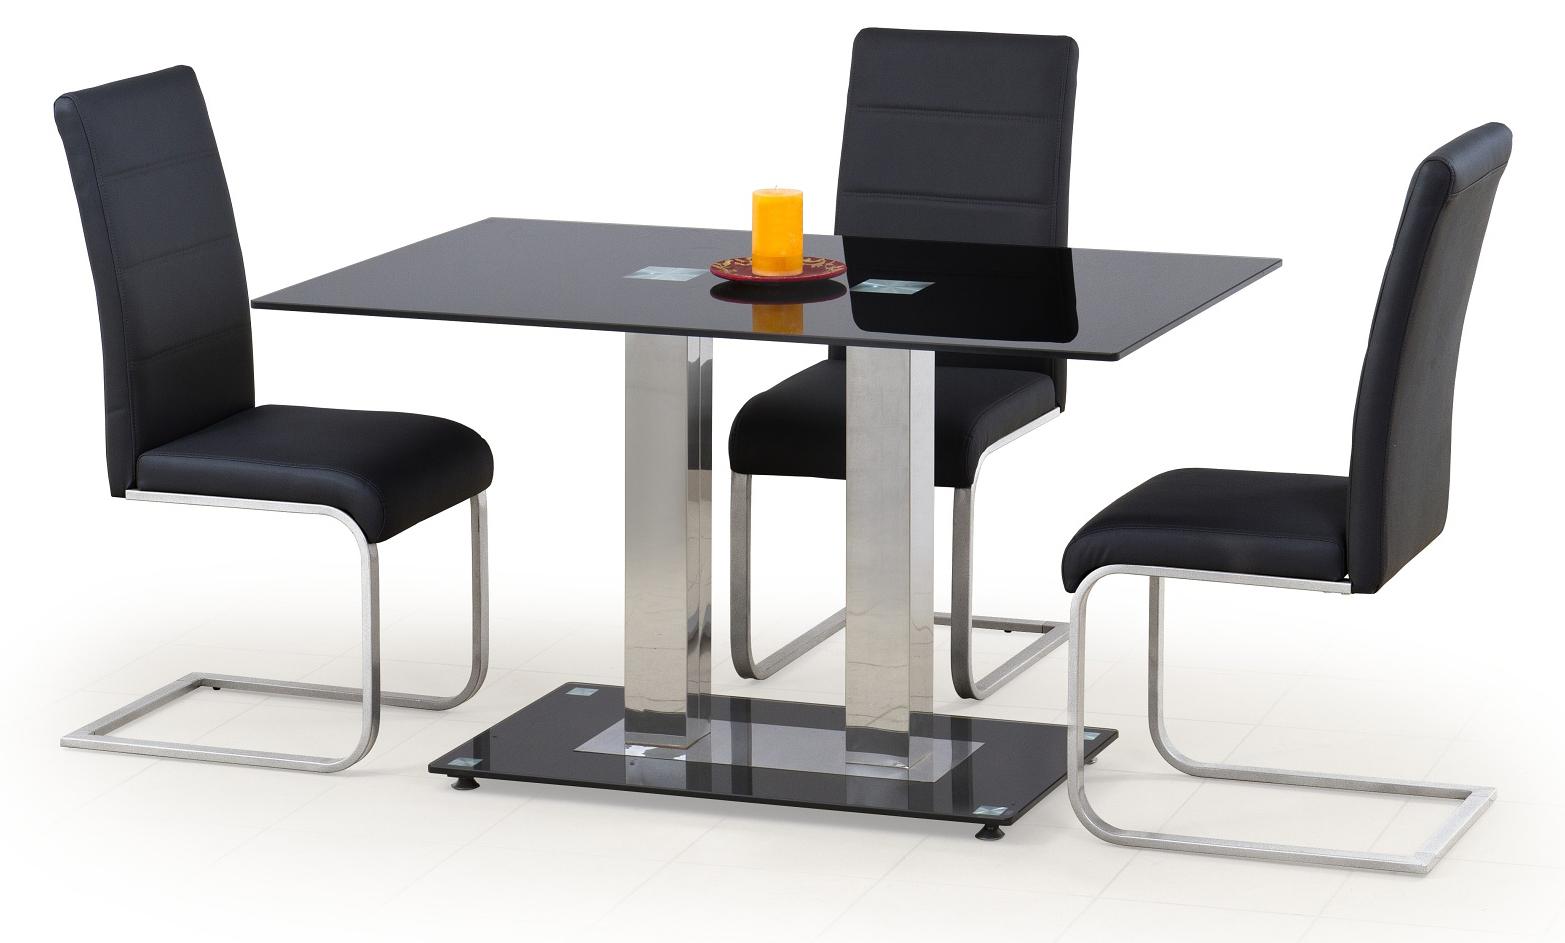 Jedálenský stôl Walter 2 (pre 4 osoby)